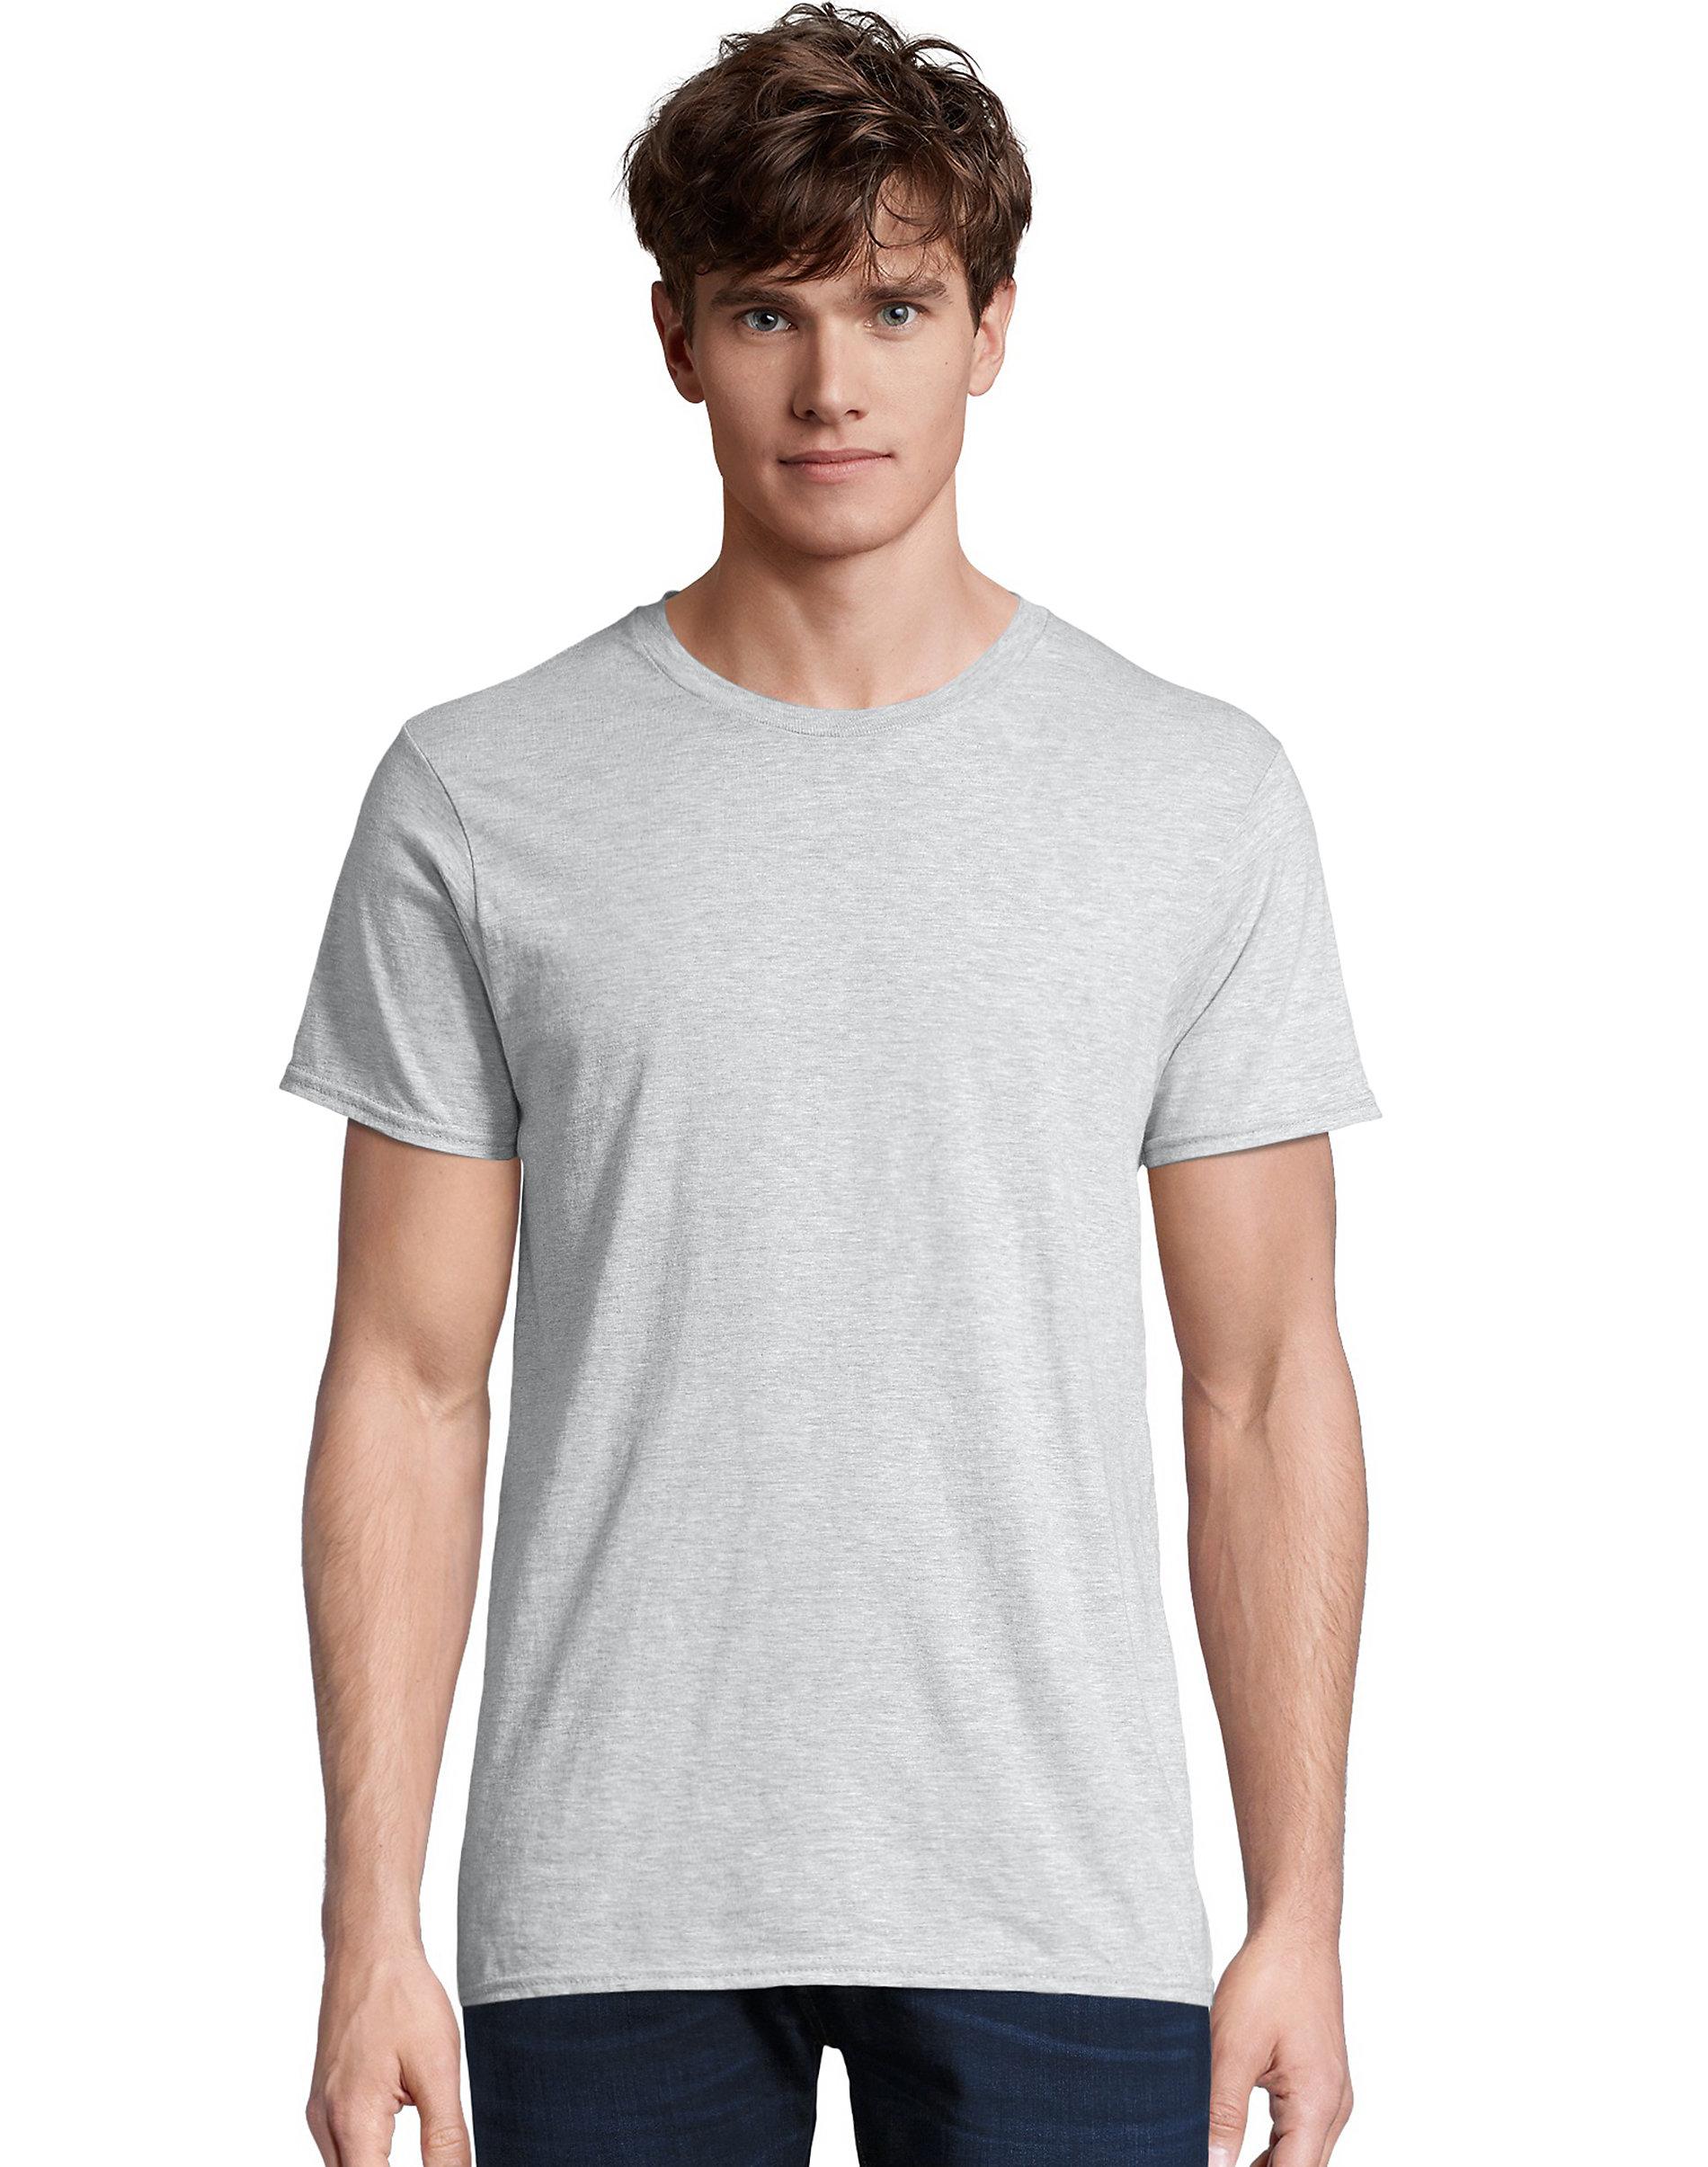 Nano-t-shirt Pour Hombres_yellow_l vente Footlocker sortie 2015 qJVb5JM